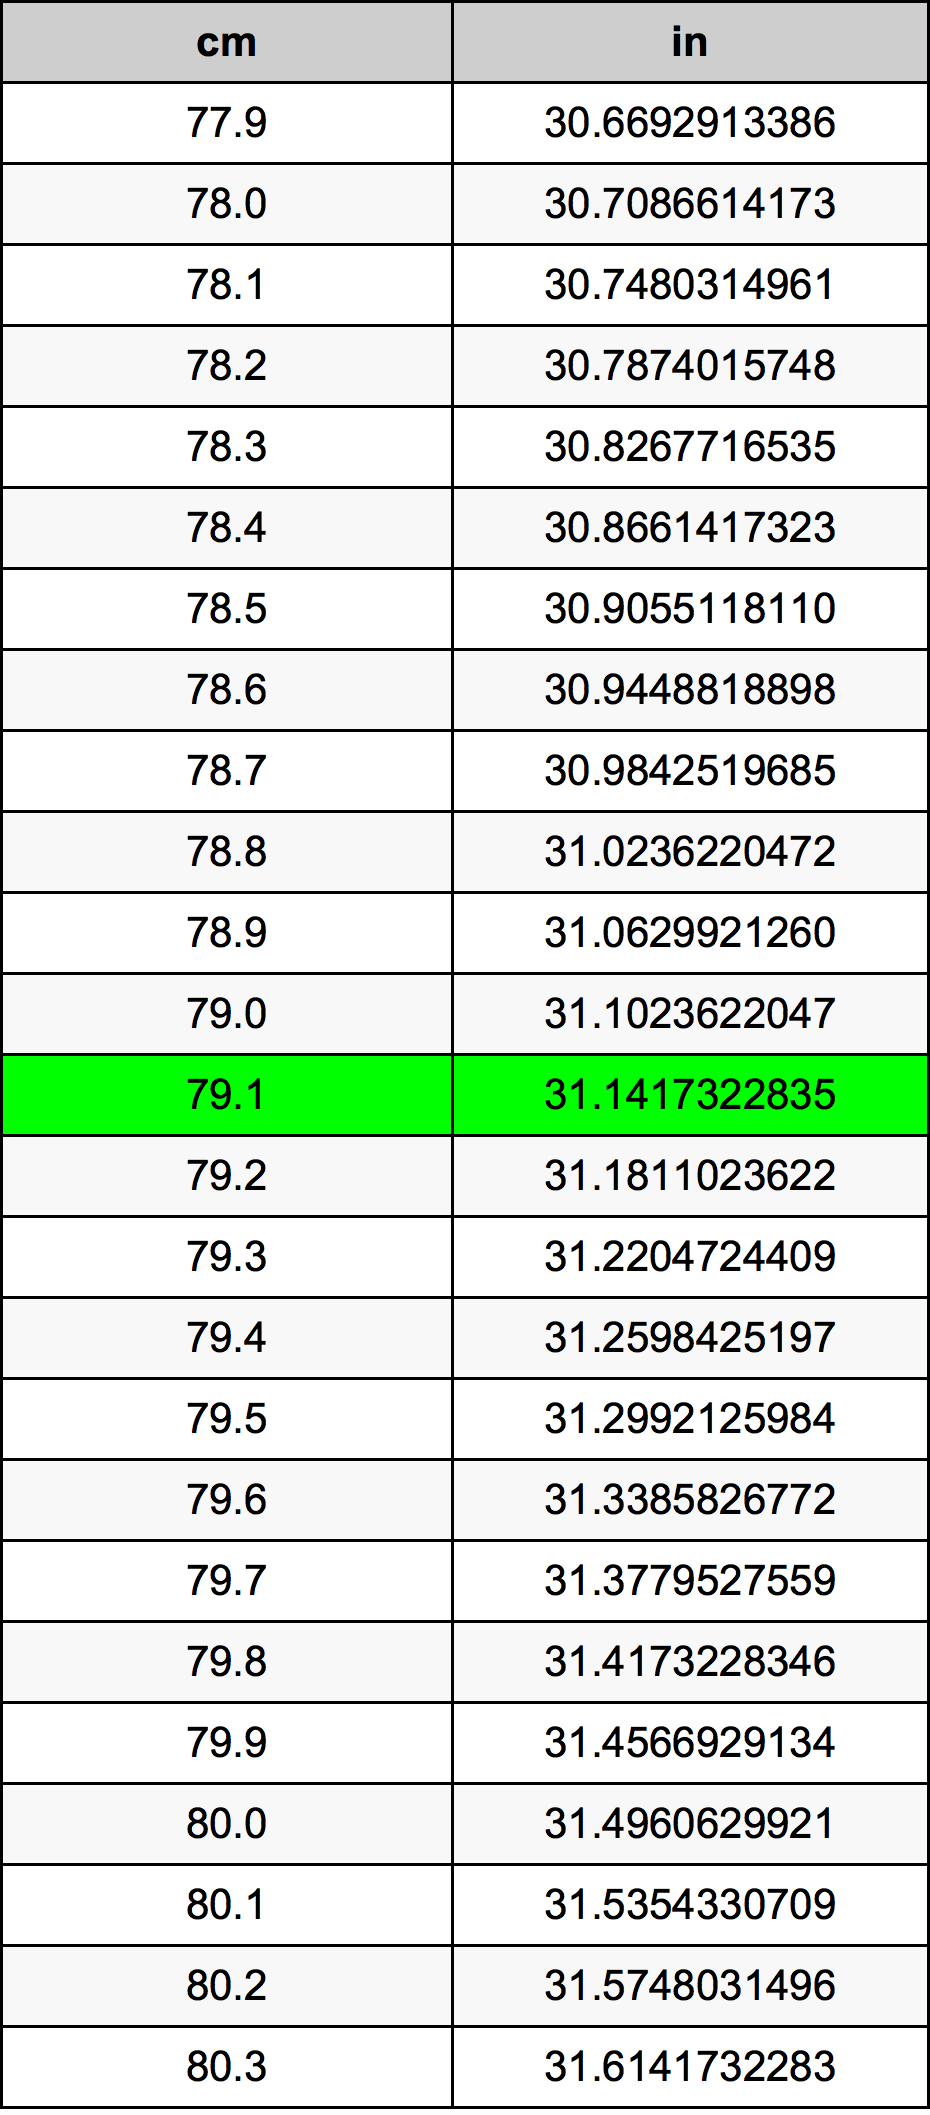 79.1 Centimeter konverteringstabellen